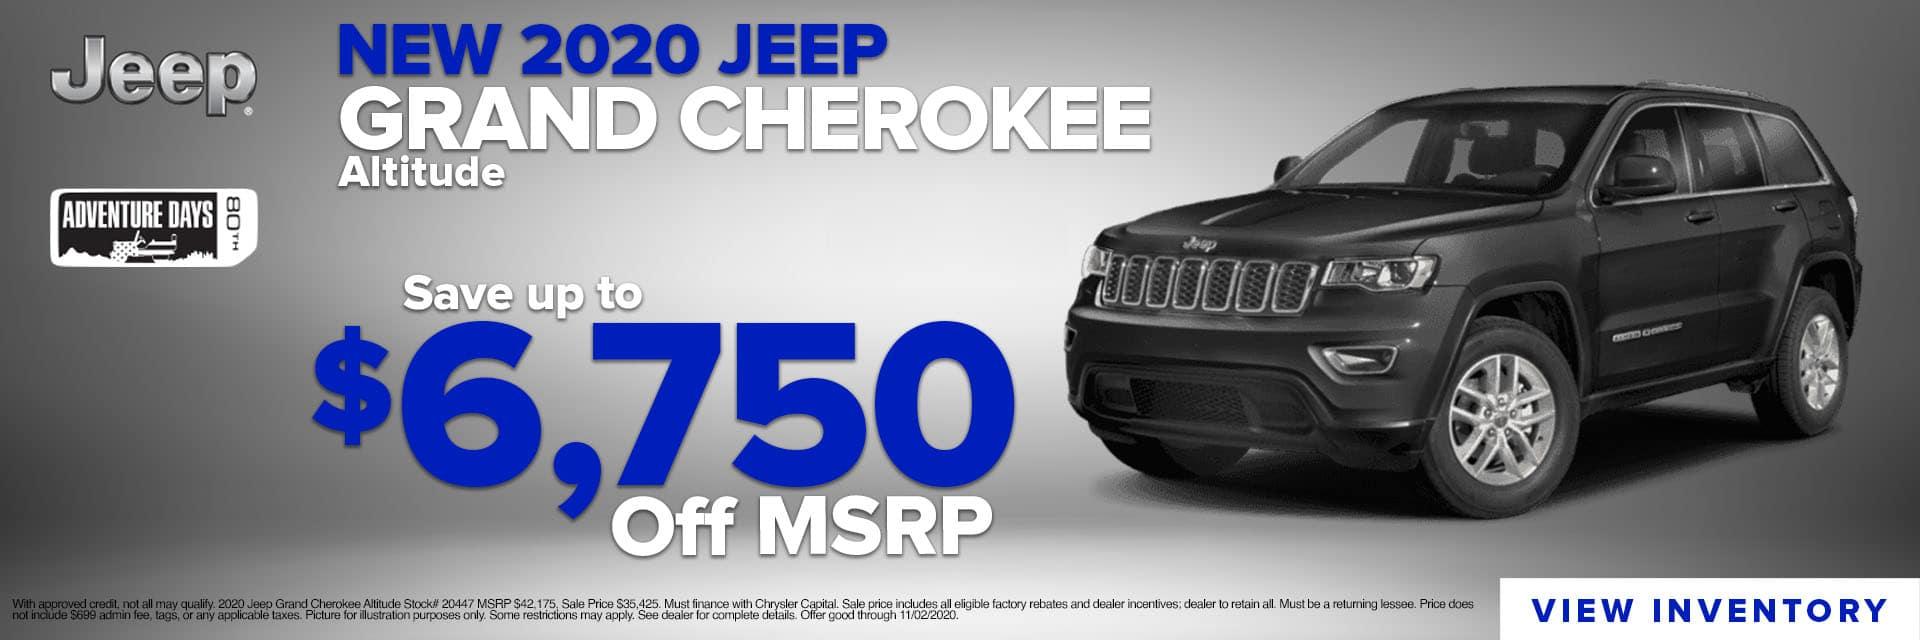 CLGO-October 2020-2020 Jeep Grand Cherokee Inspire Slider